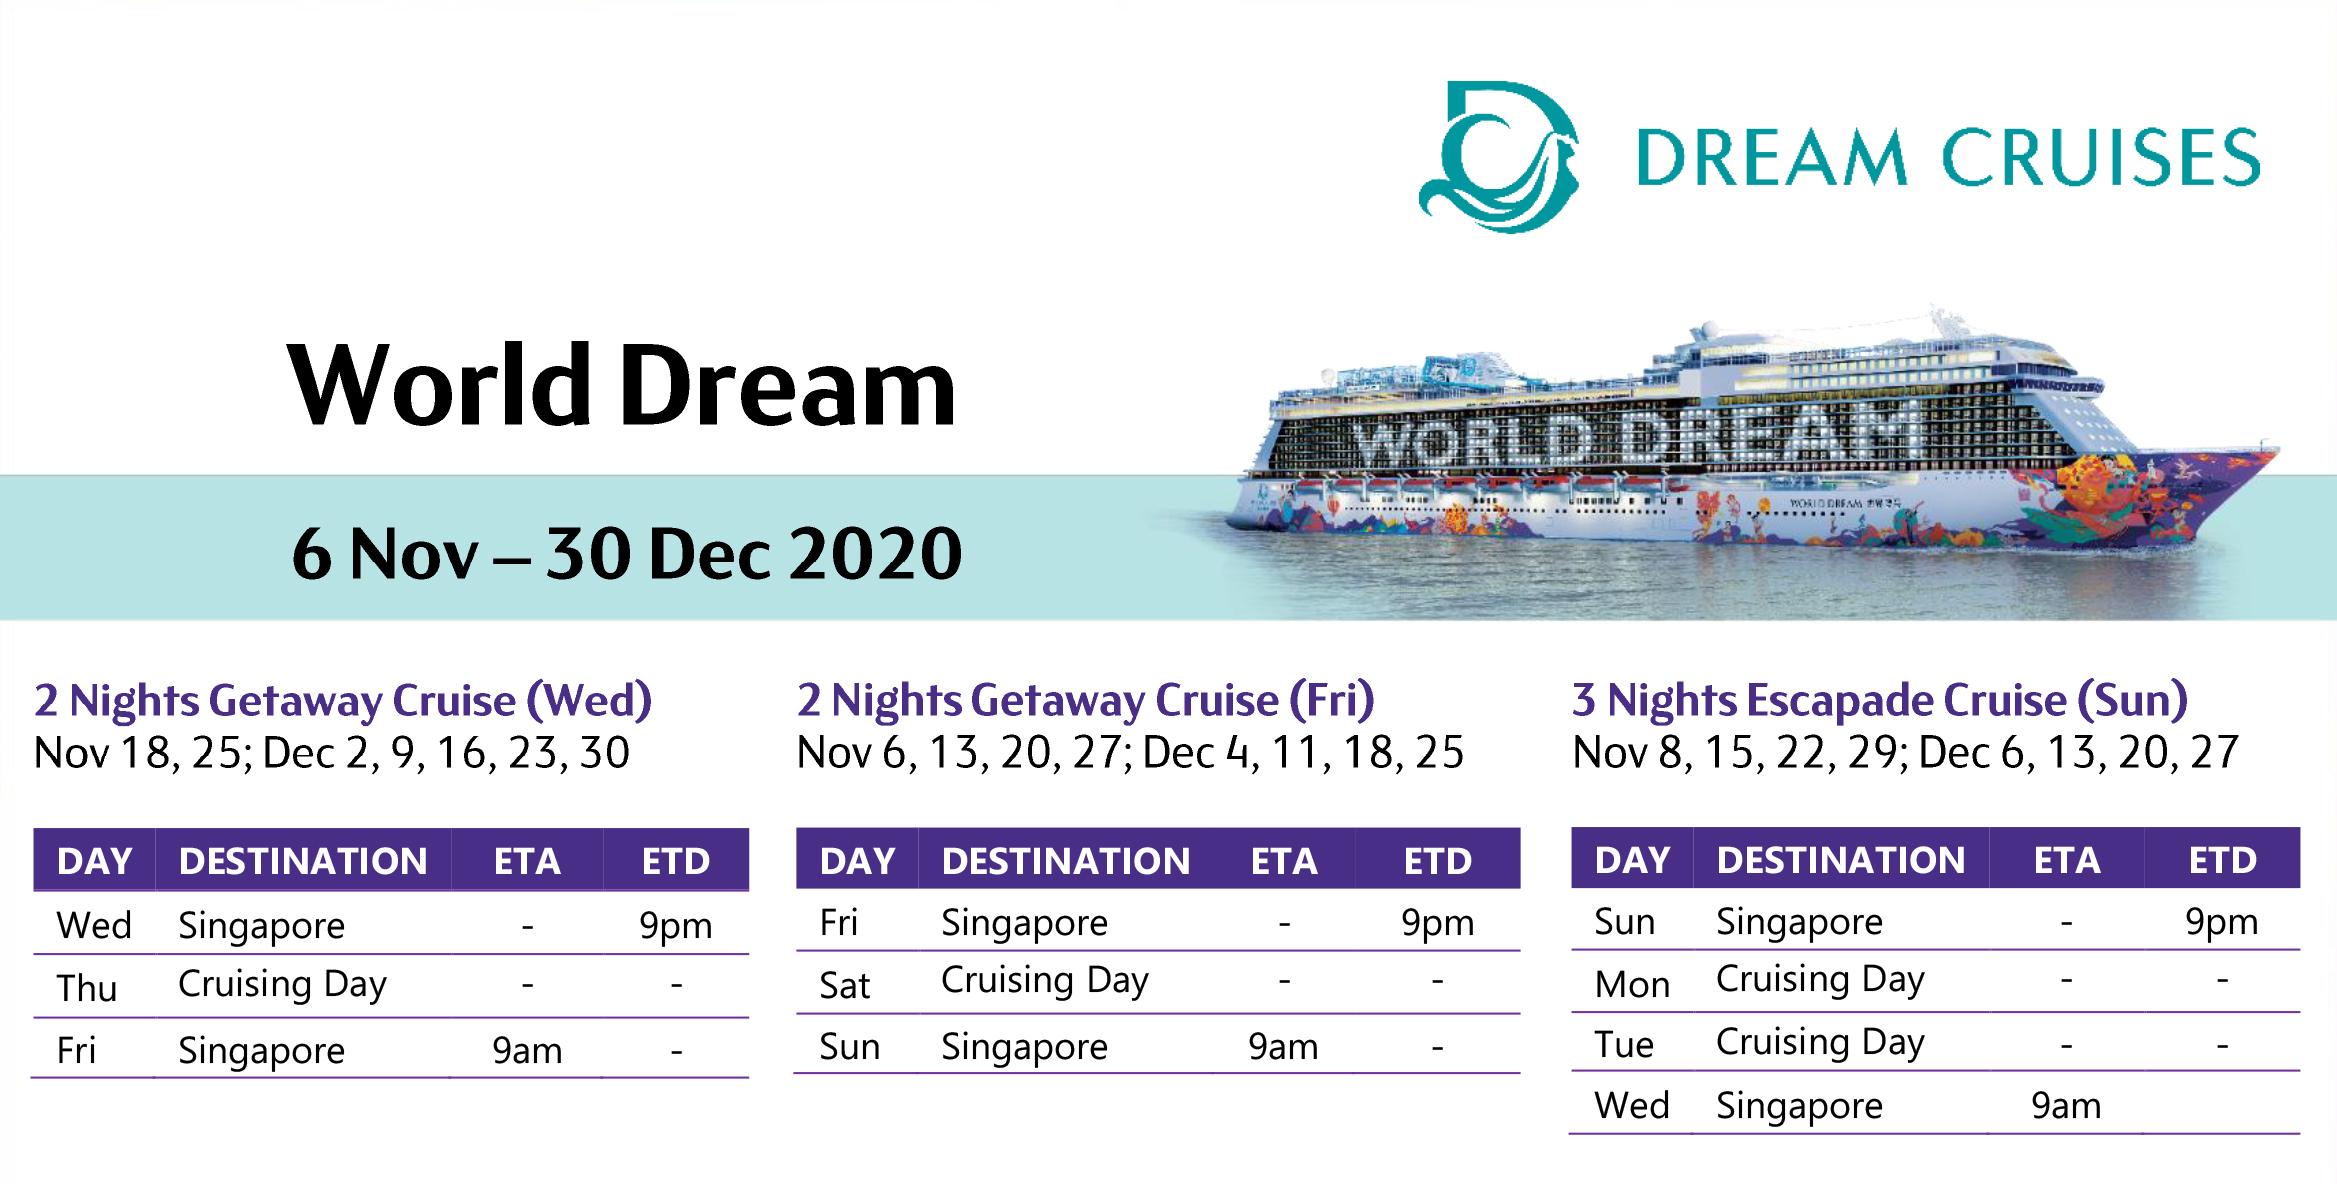 HIS Travel Dream Cruise Schedule November - December 2020 Dates